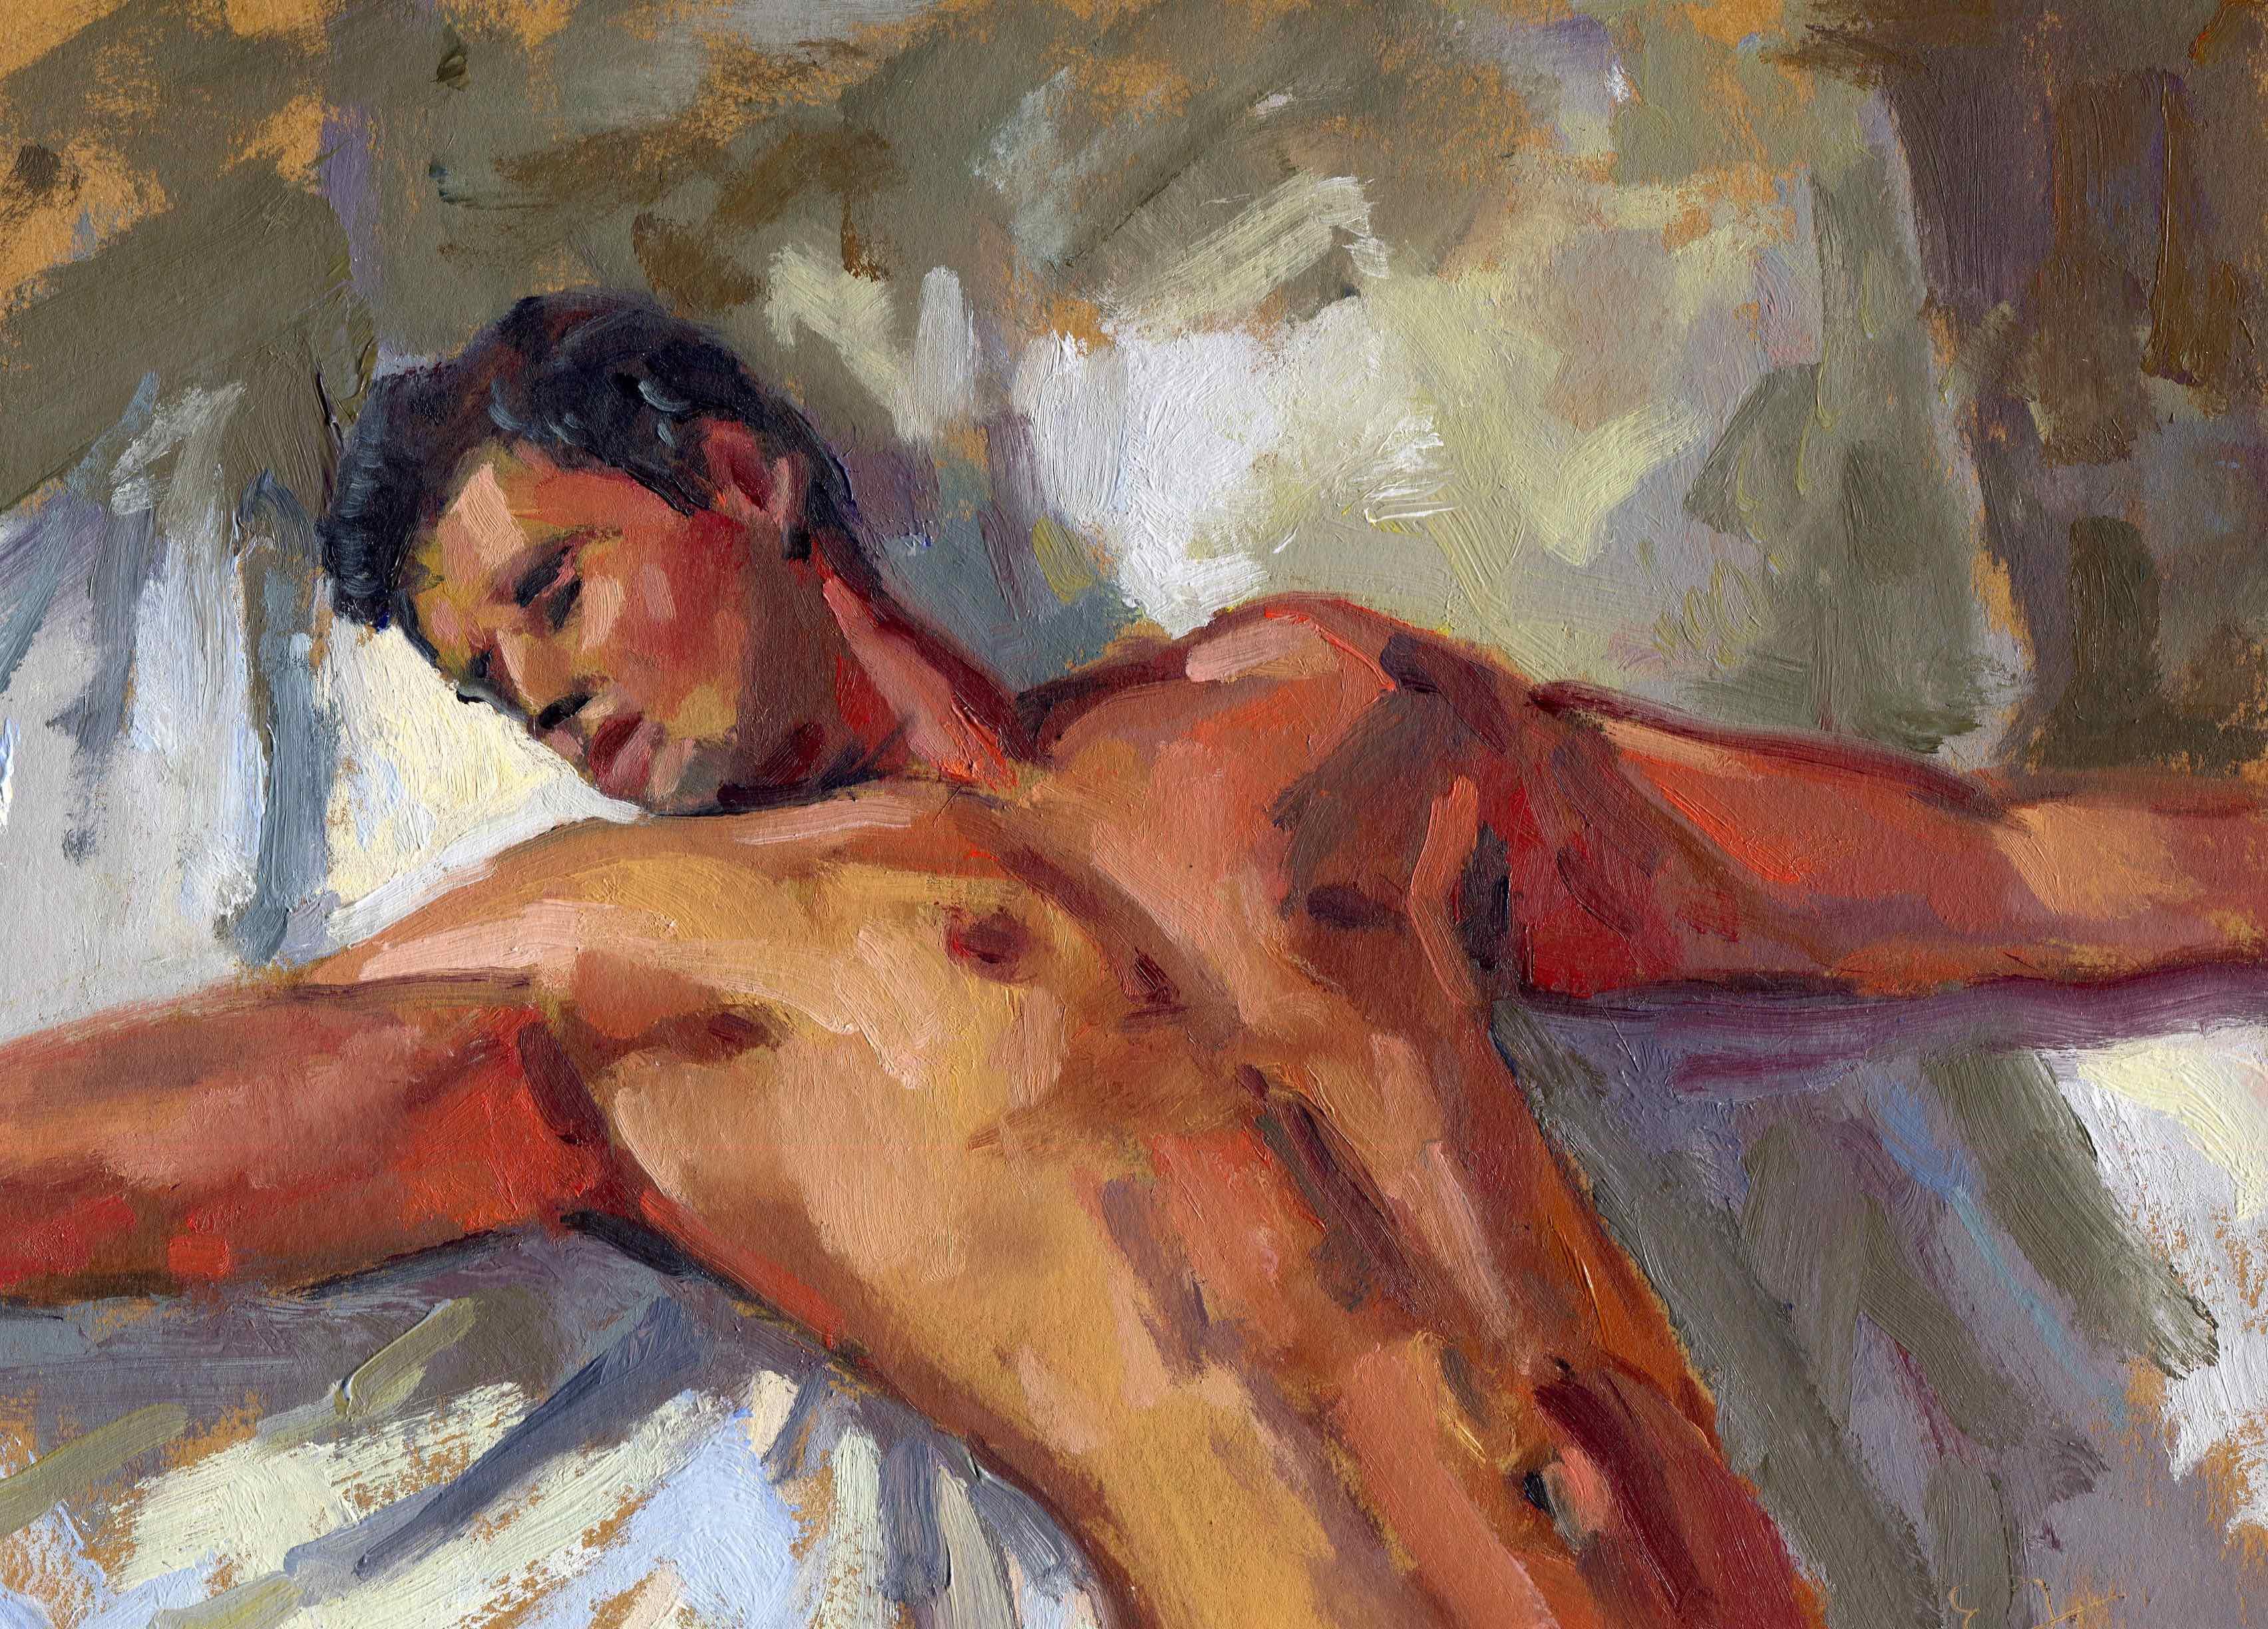 Stretch in Bed